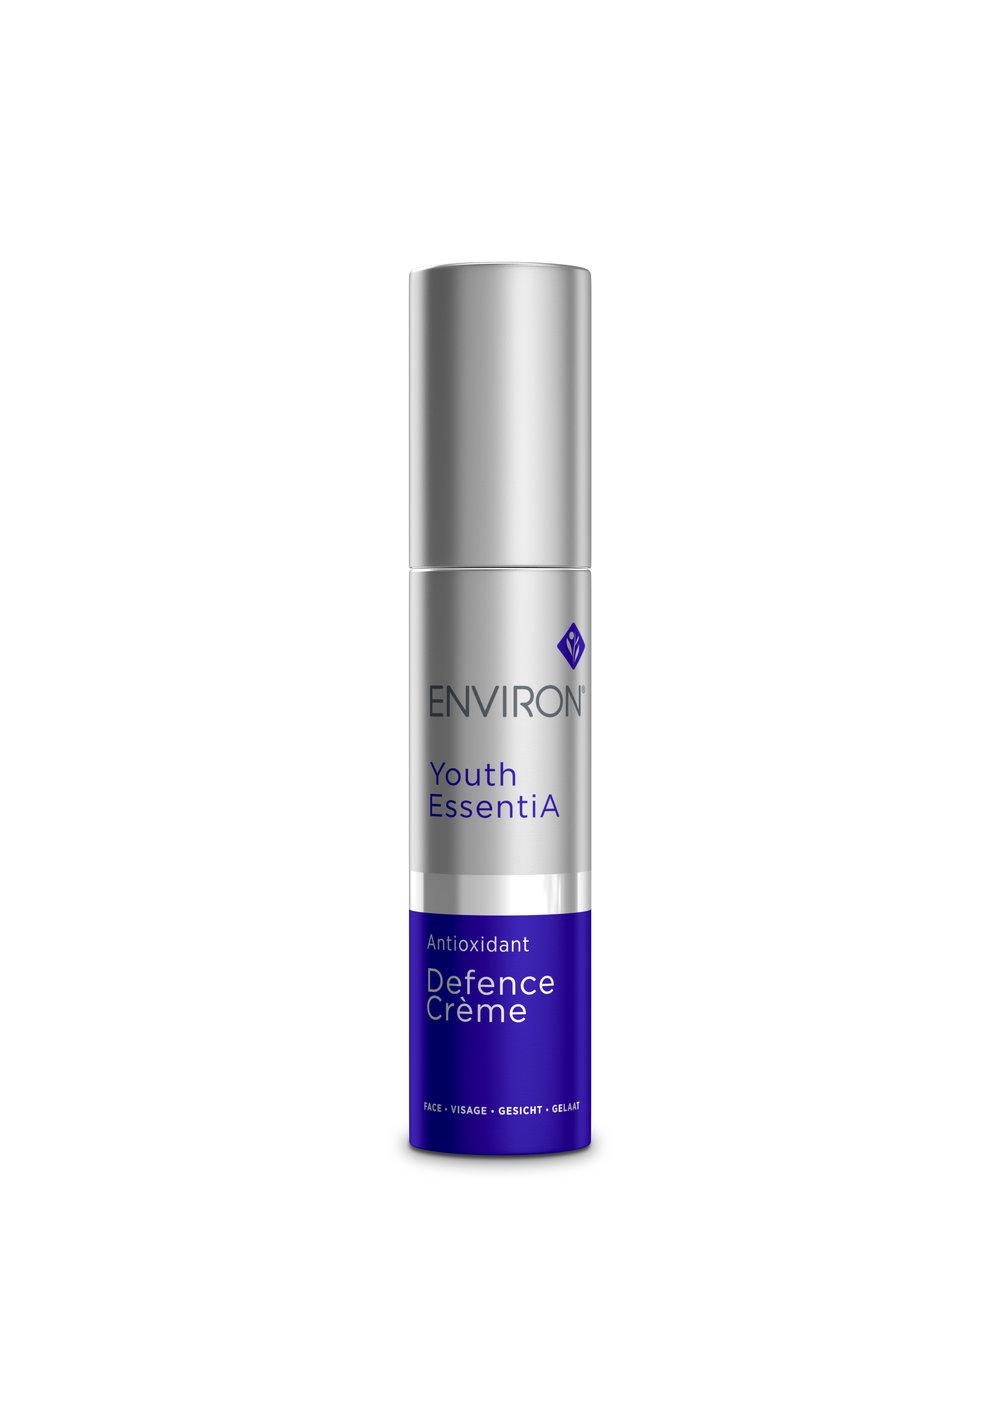 Environ YE Antioxidant Creme copy.jpg